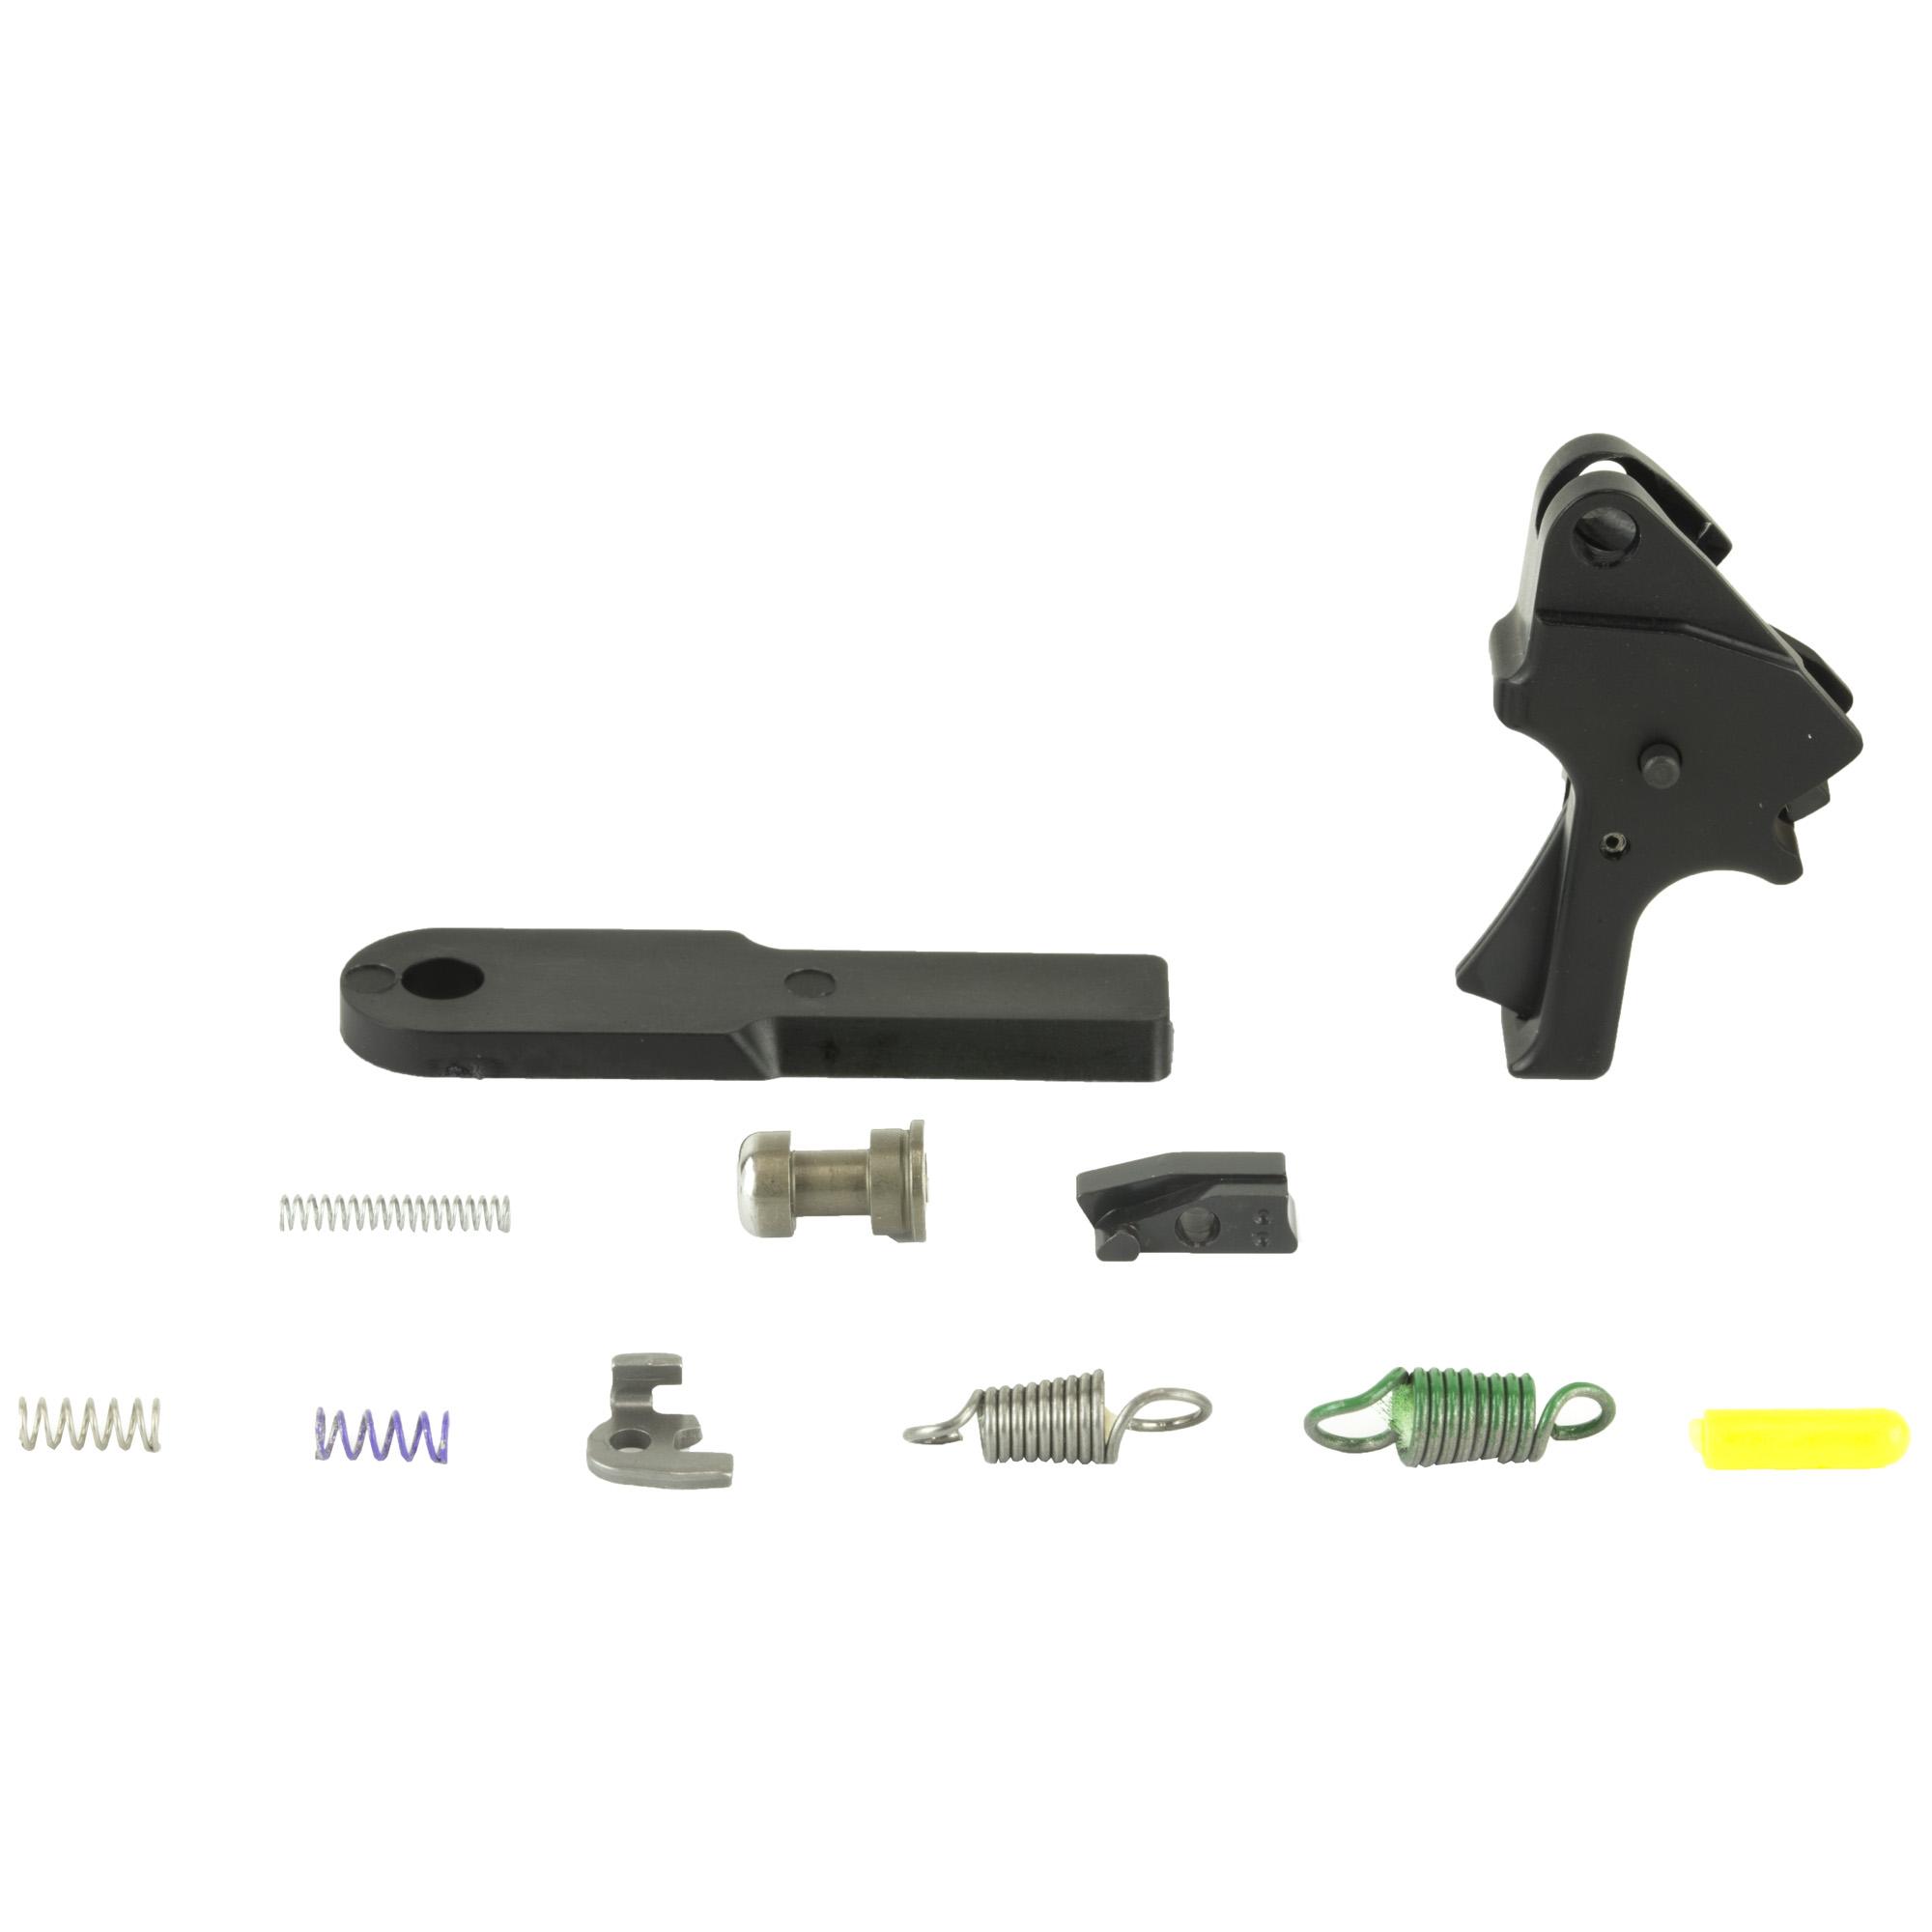 Apex M2.0 Flat Forward Set Trgr Kit